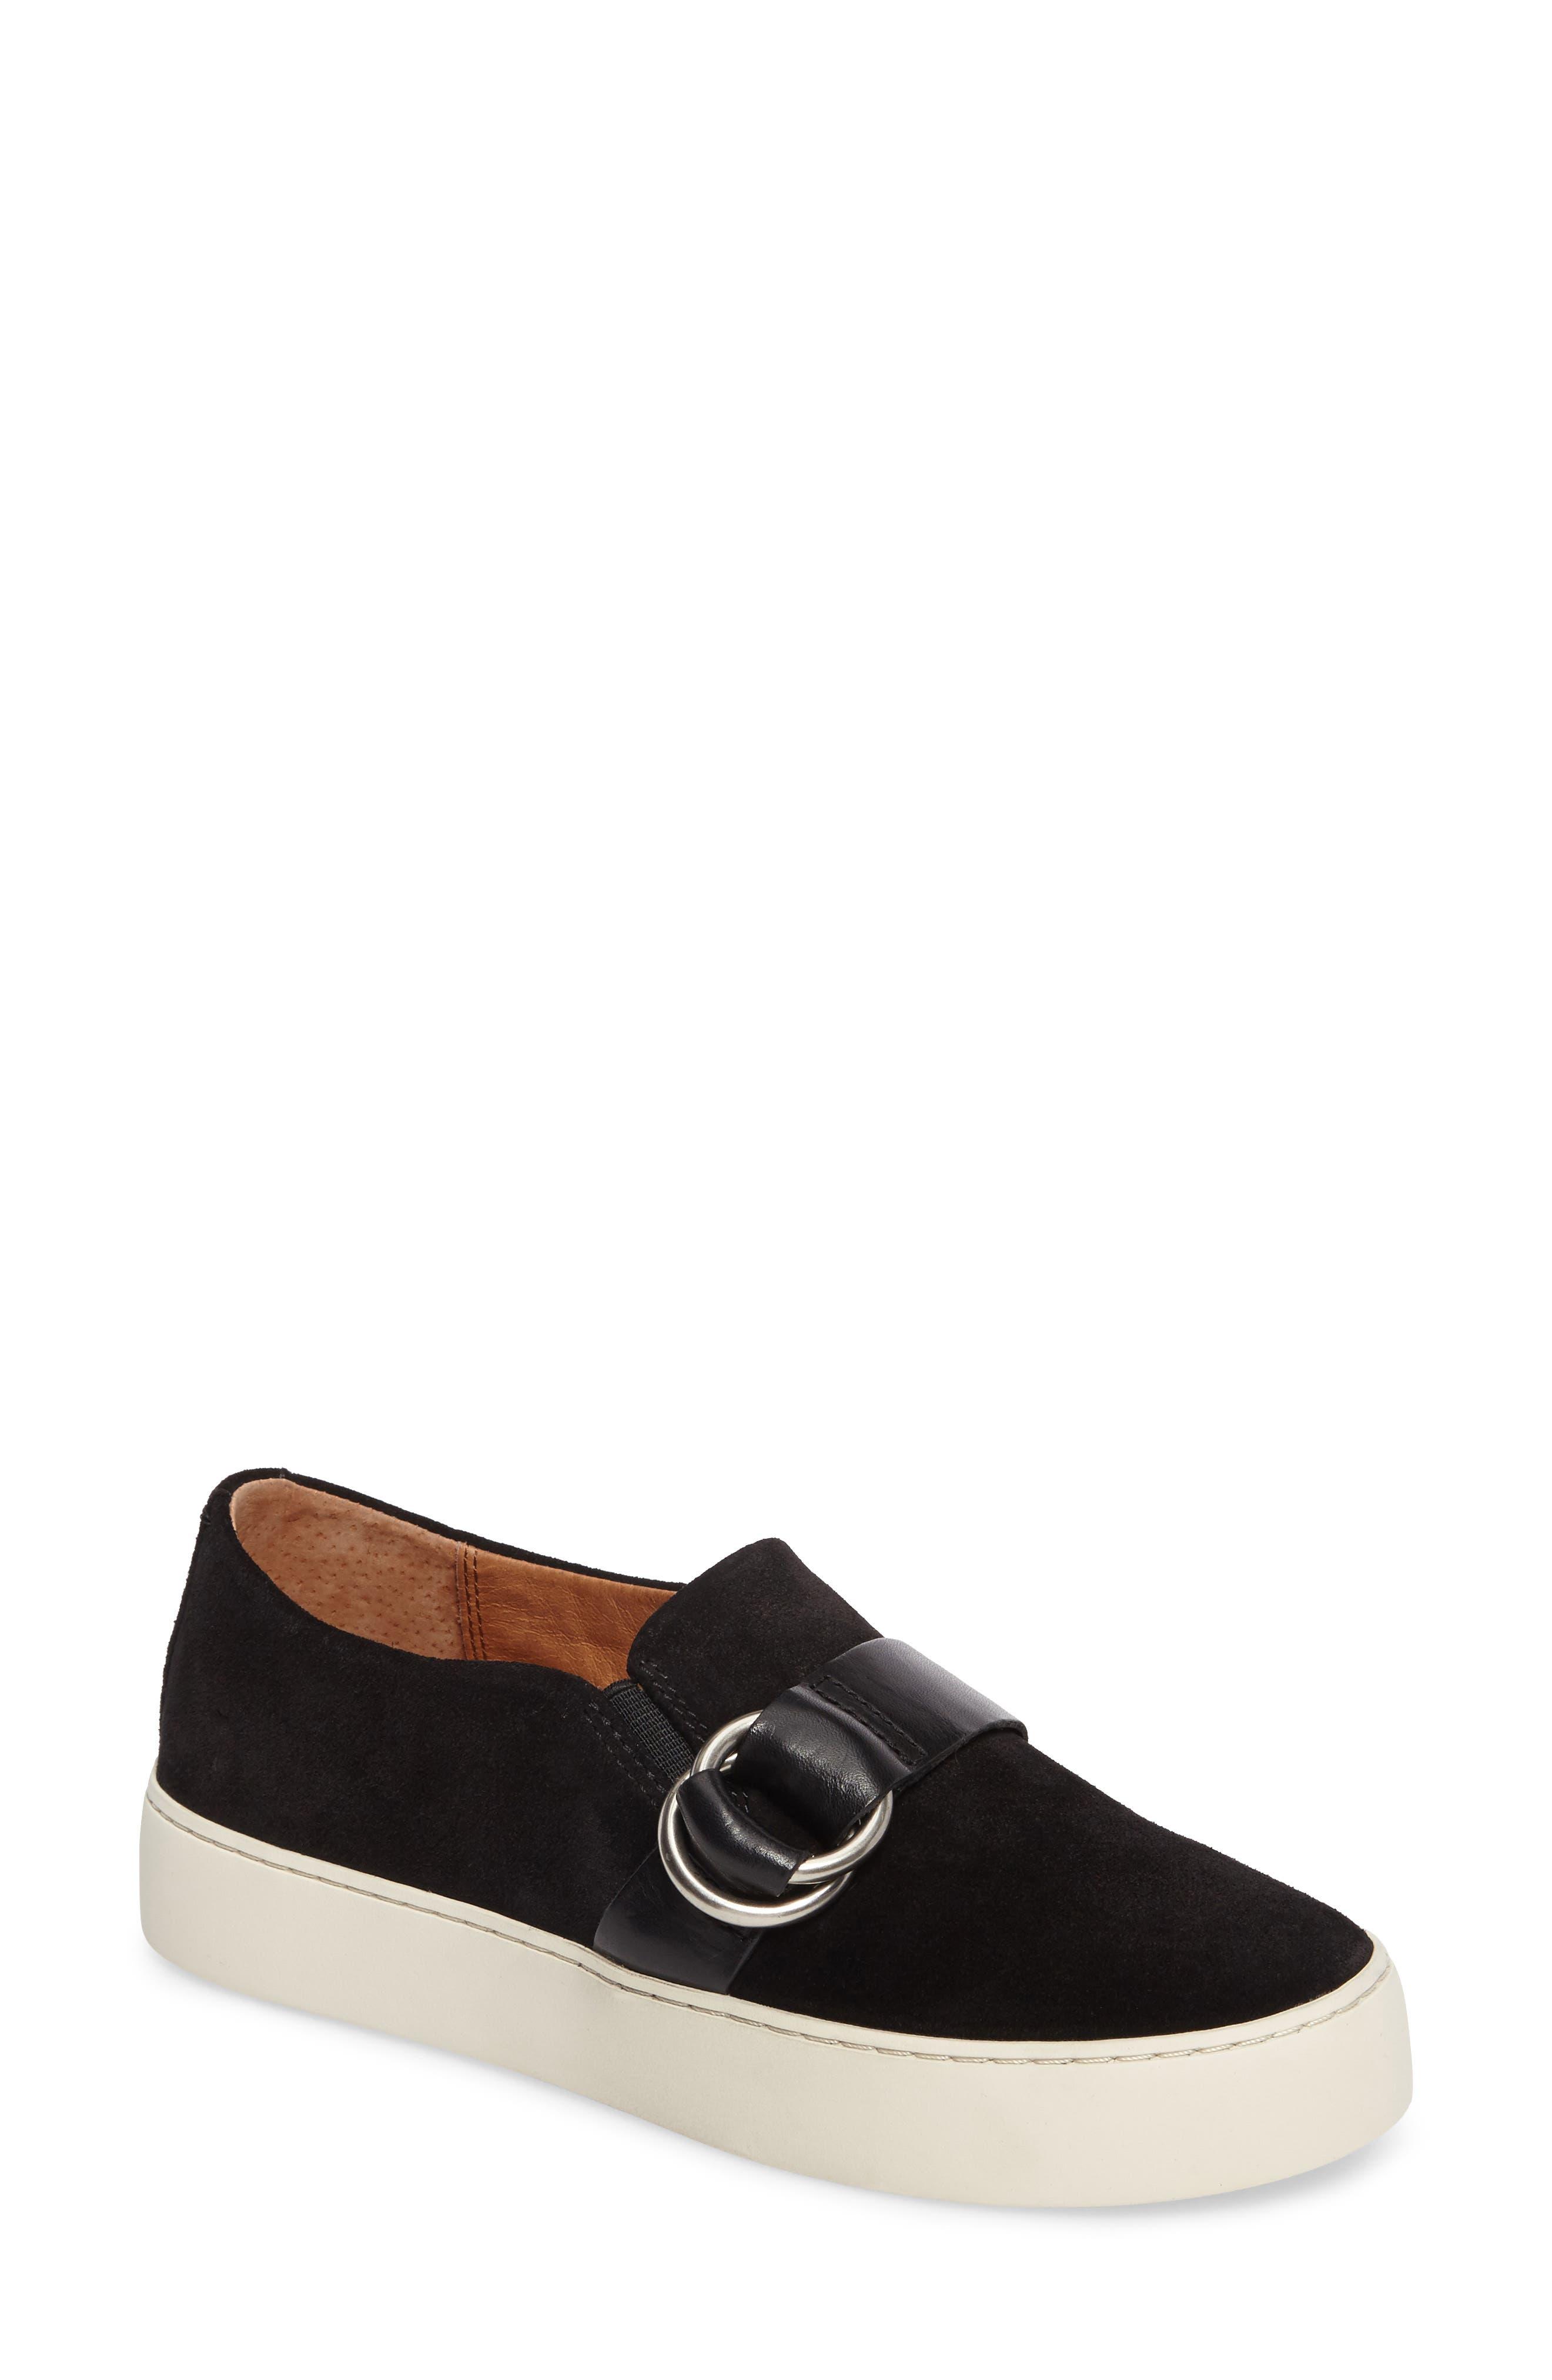 Lena Harness Slip-On Sneaker,                             Main thumbnail 1, color,                             Black